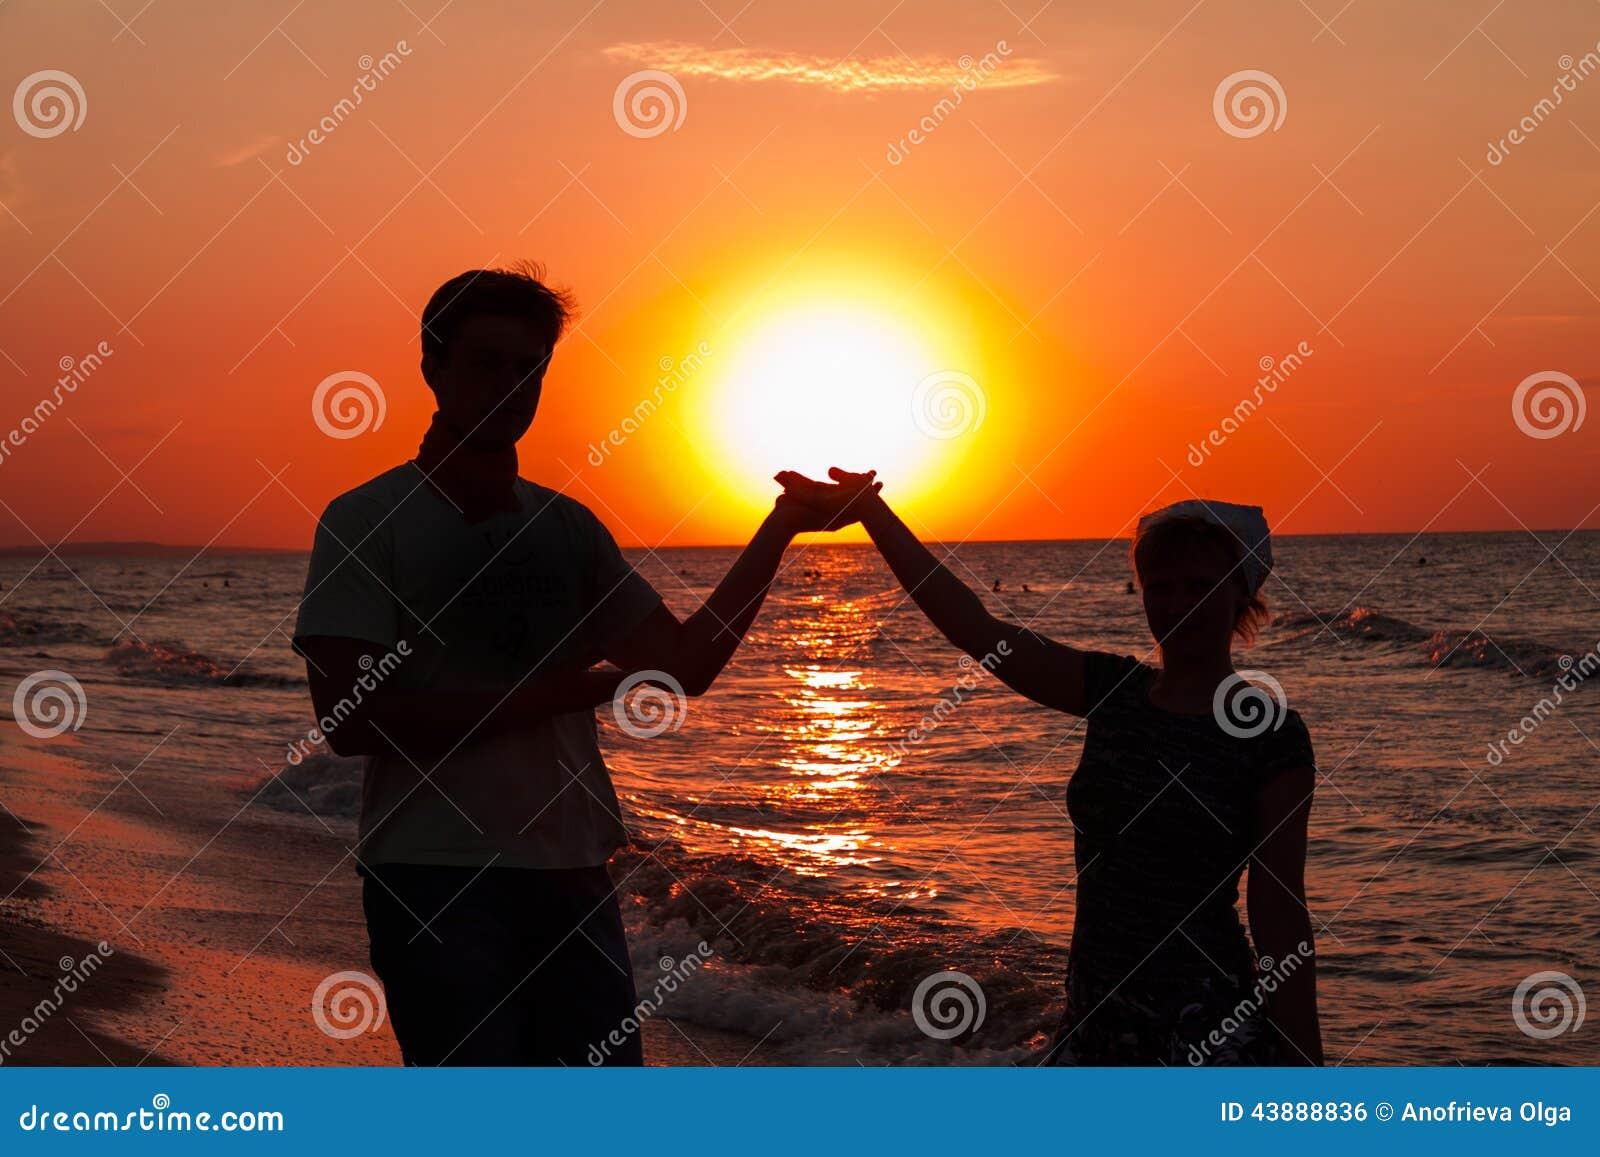 Romantic sunset